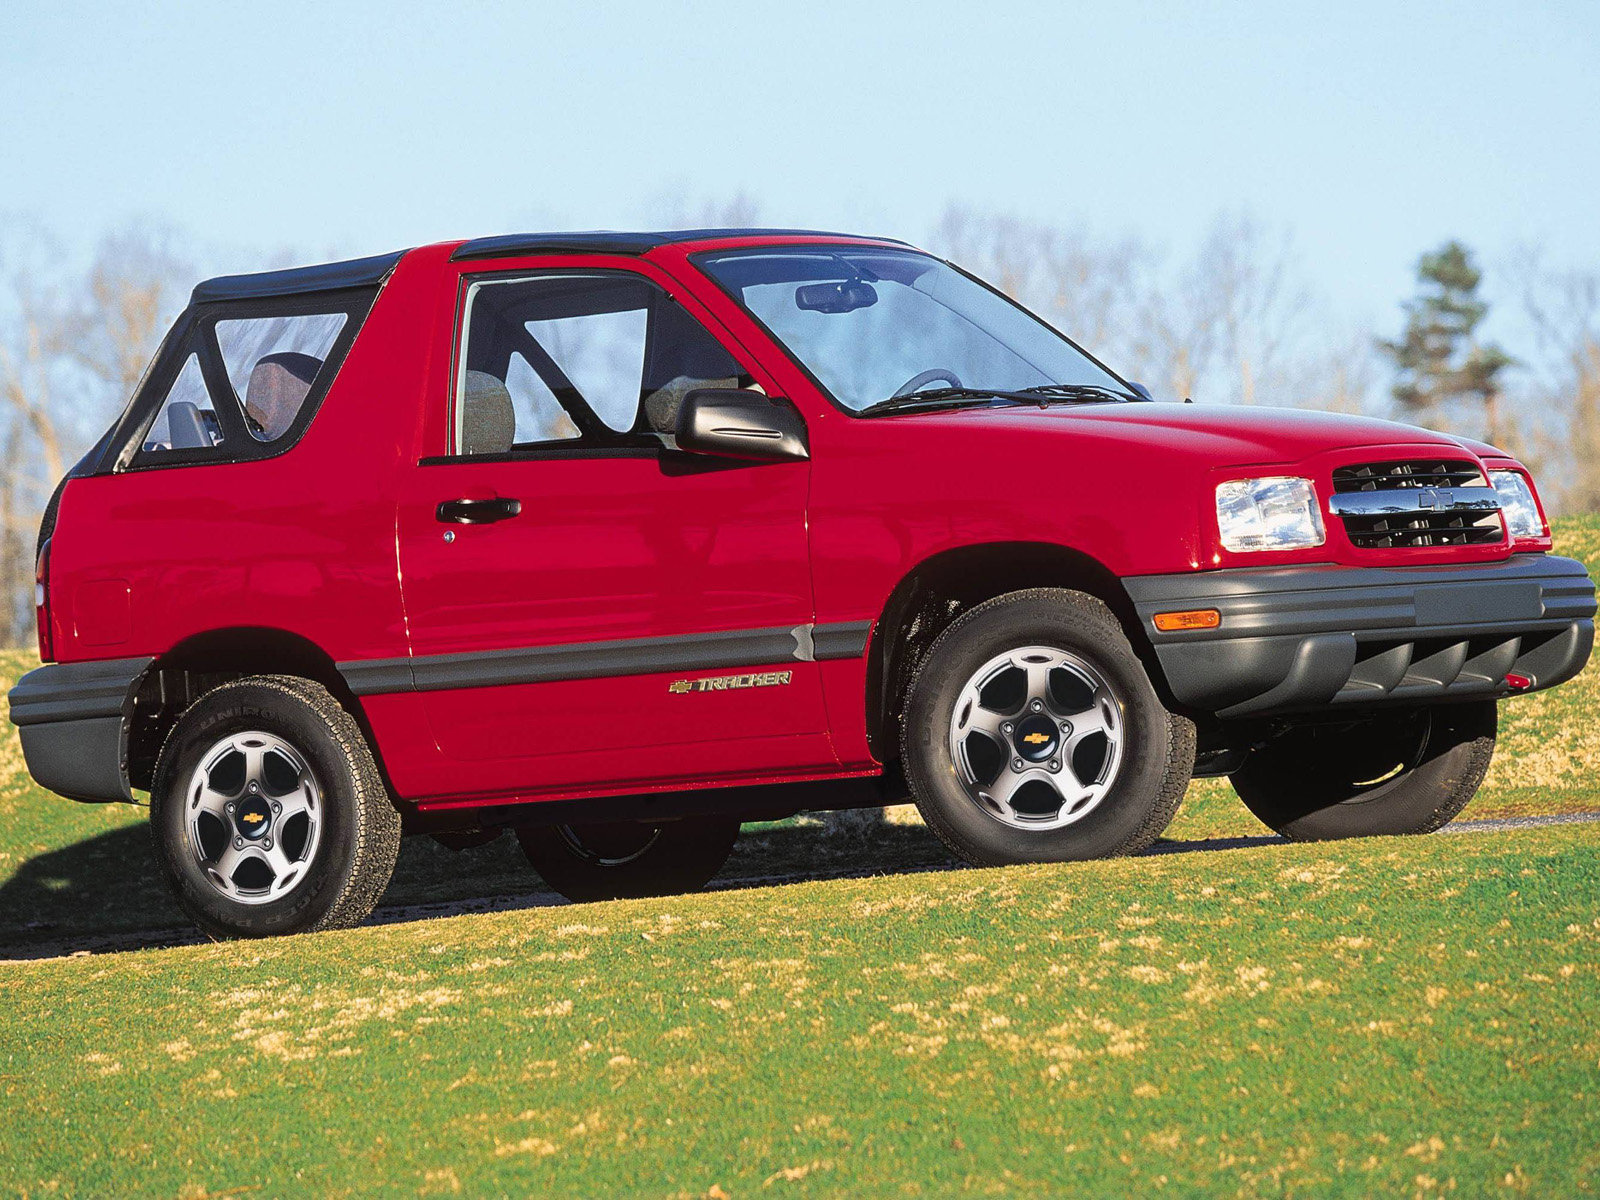 Chevrolet Tracker 2 дв. внедорожник Tracker